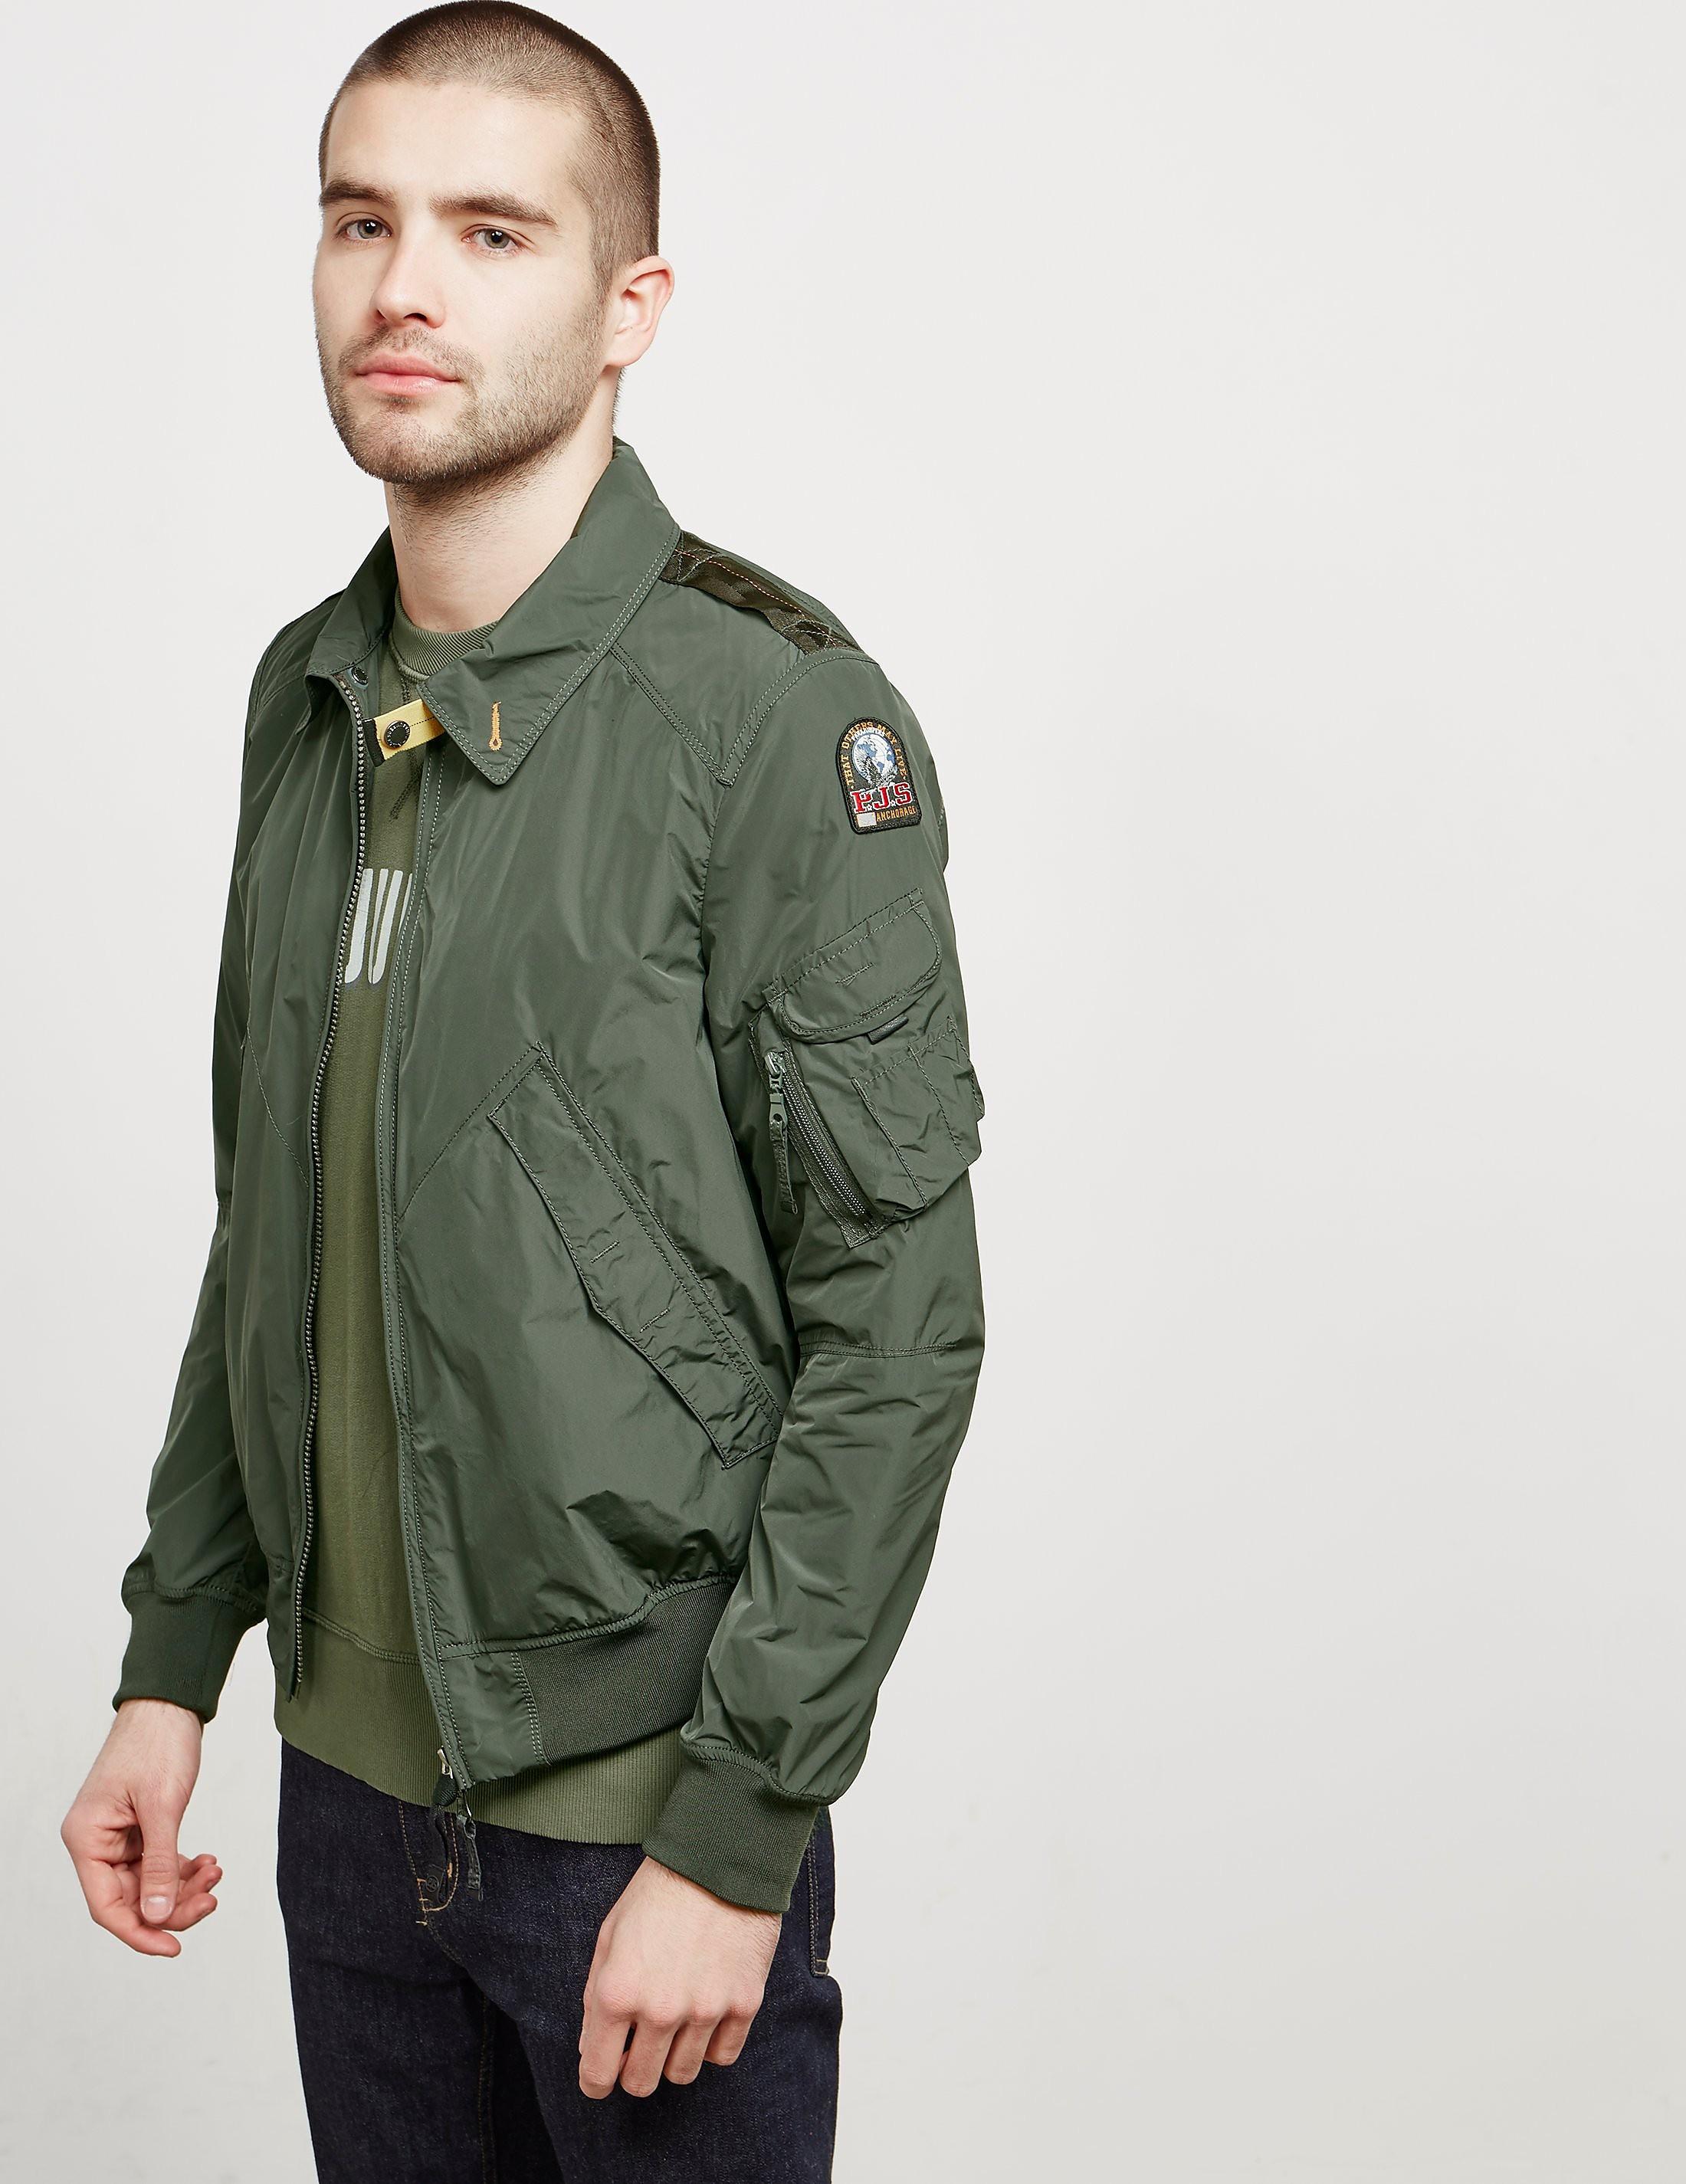 Parajumpers Brigadier Bomber Jacket